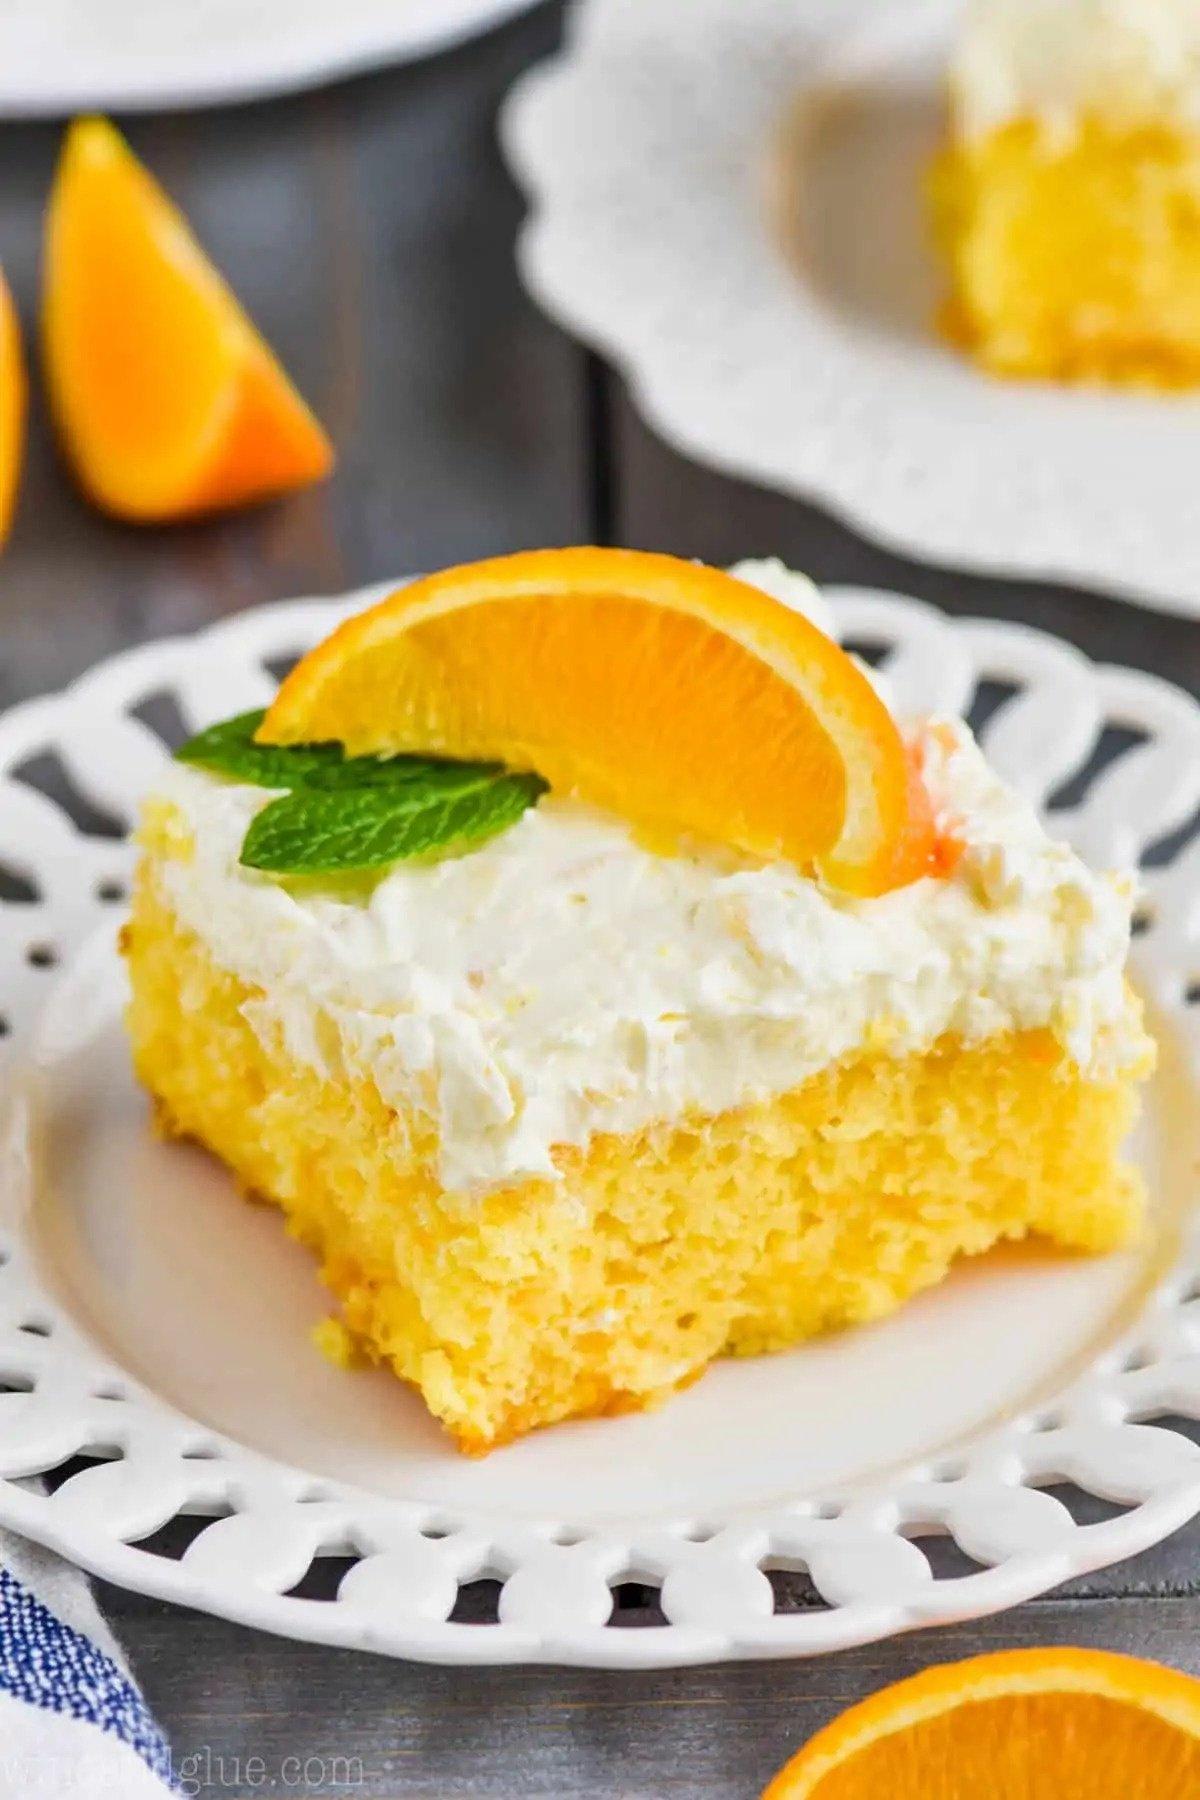 Pastel de Naranja y Mandarina